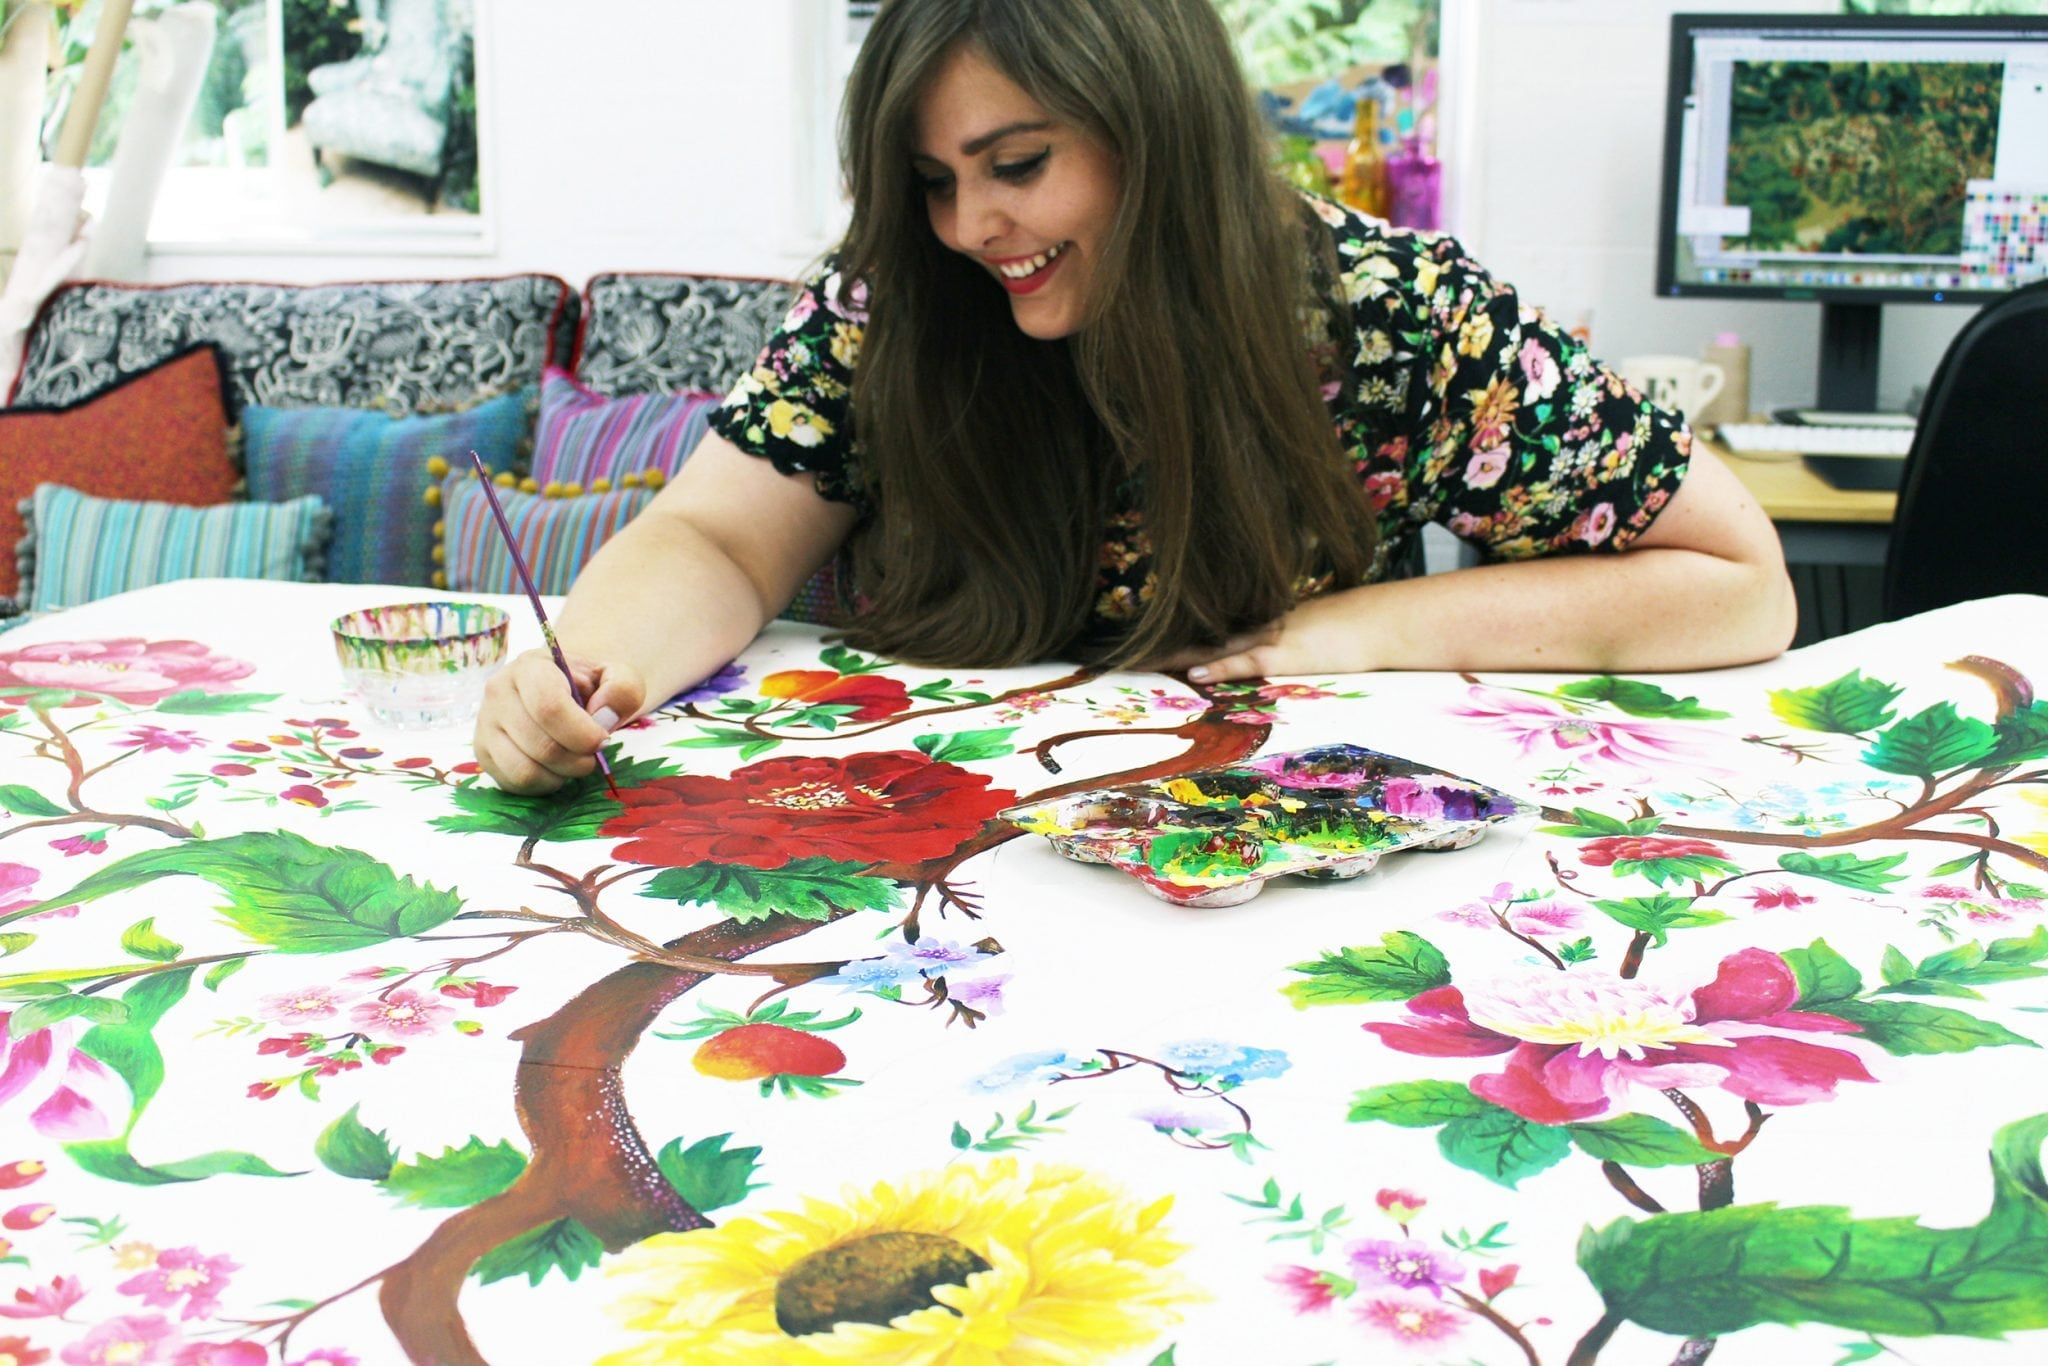 AUB alumna, Yasmin Smith: Senior Designer